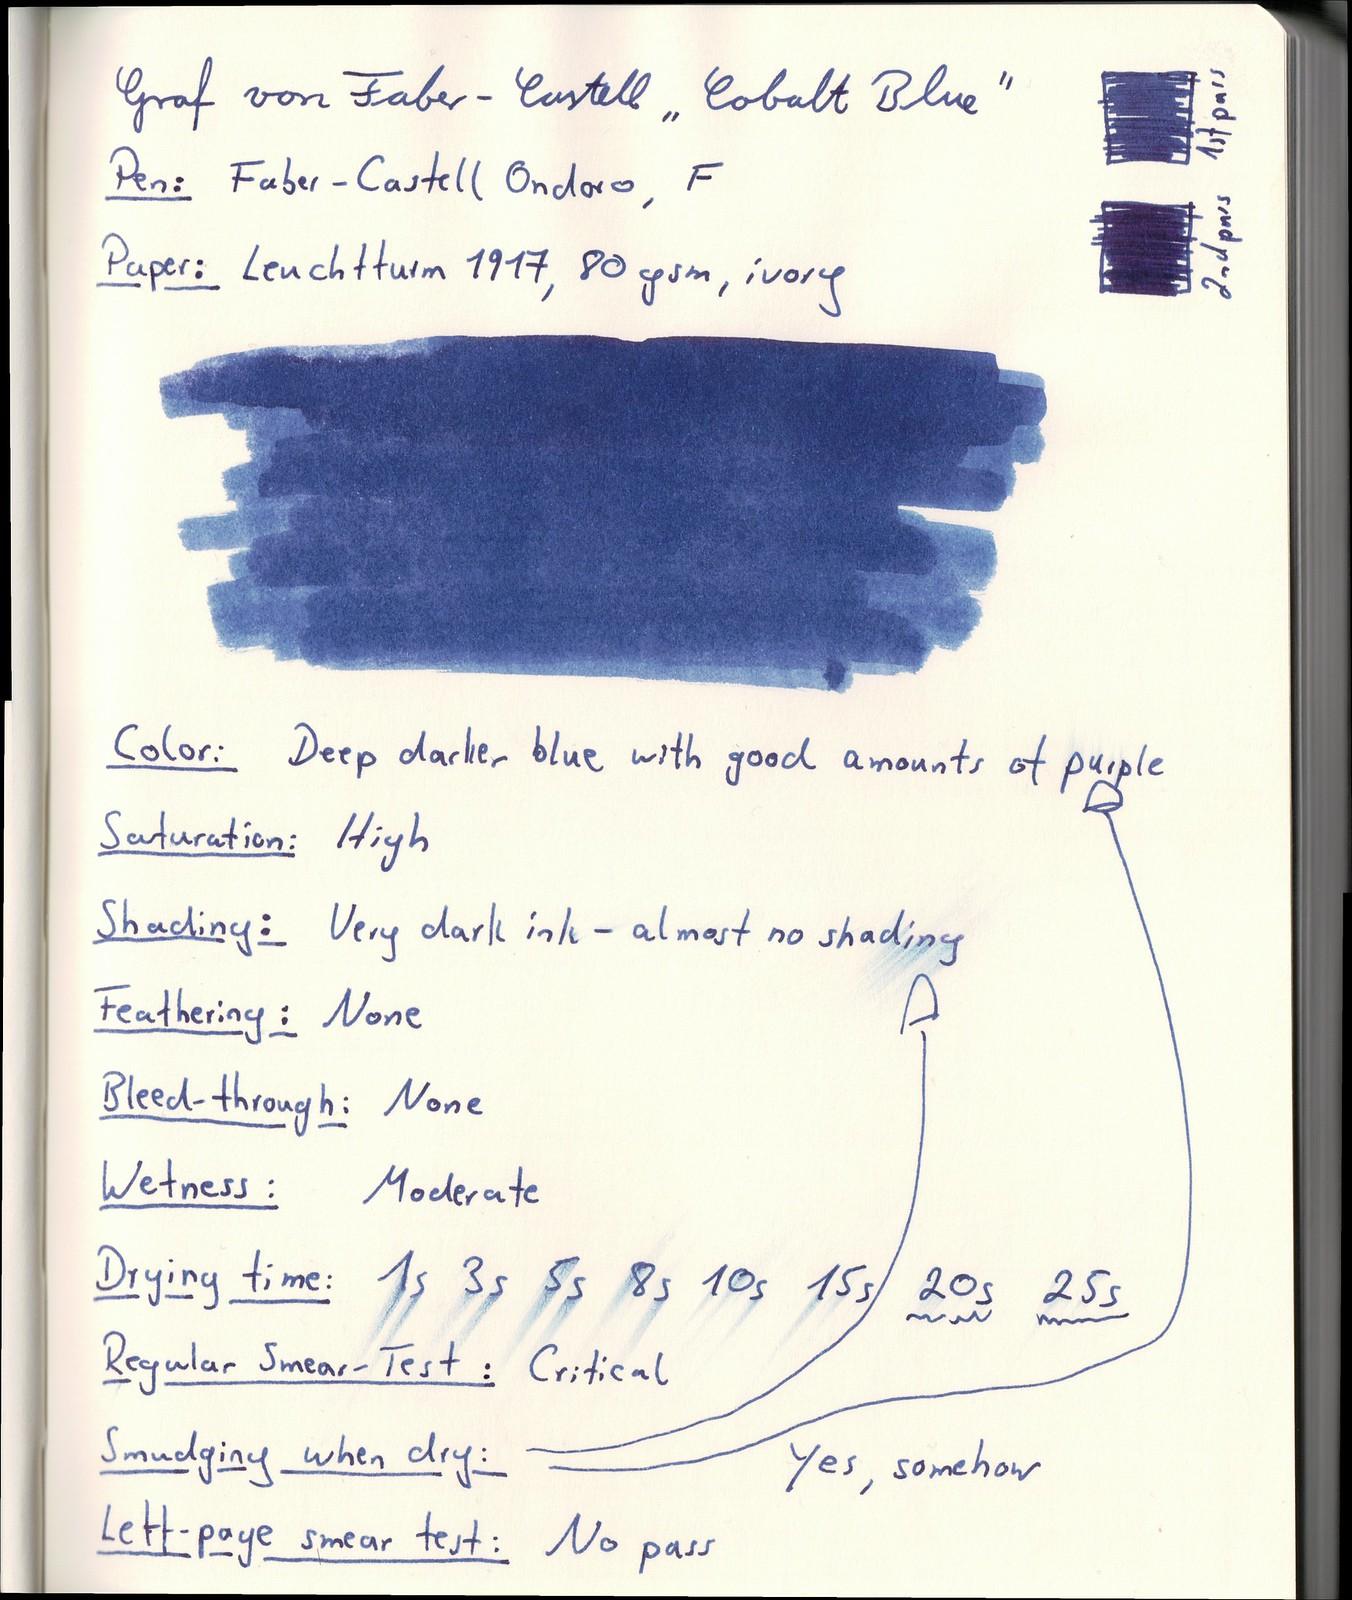 GvFC Cobalt Blue